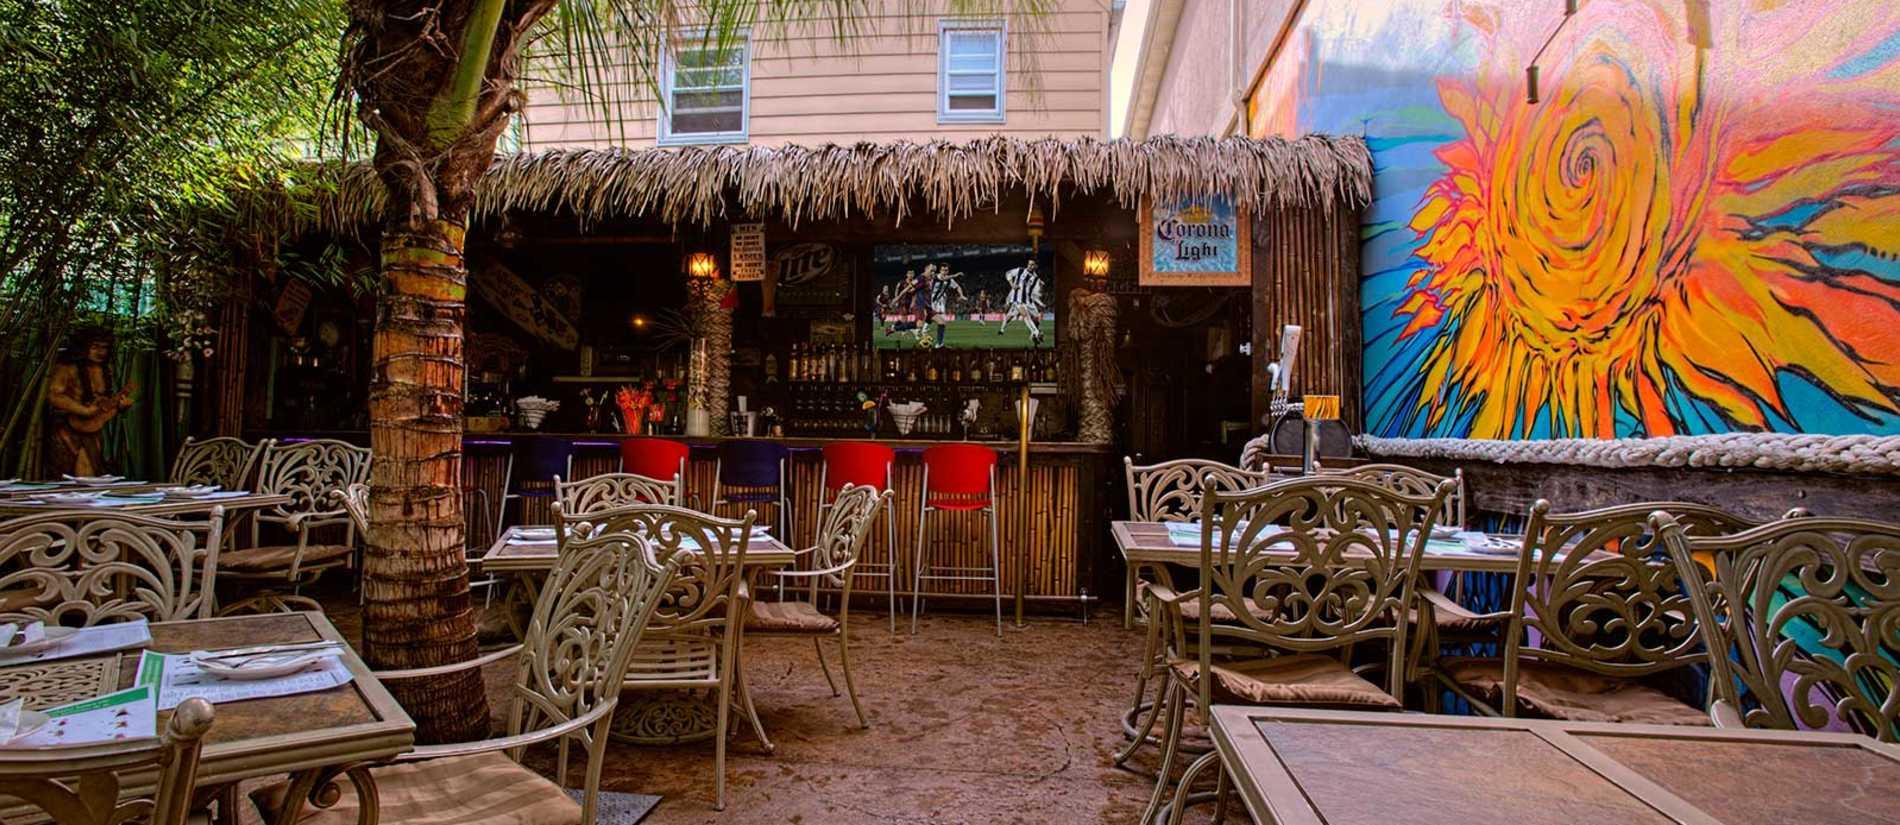 Newark Nj Restaurants Experience Outdoor Dining